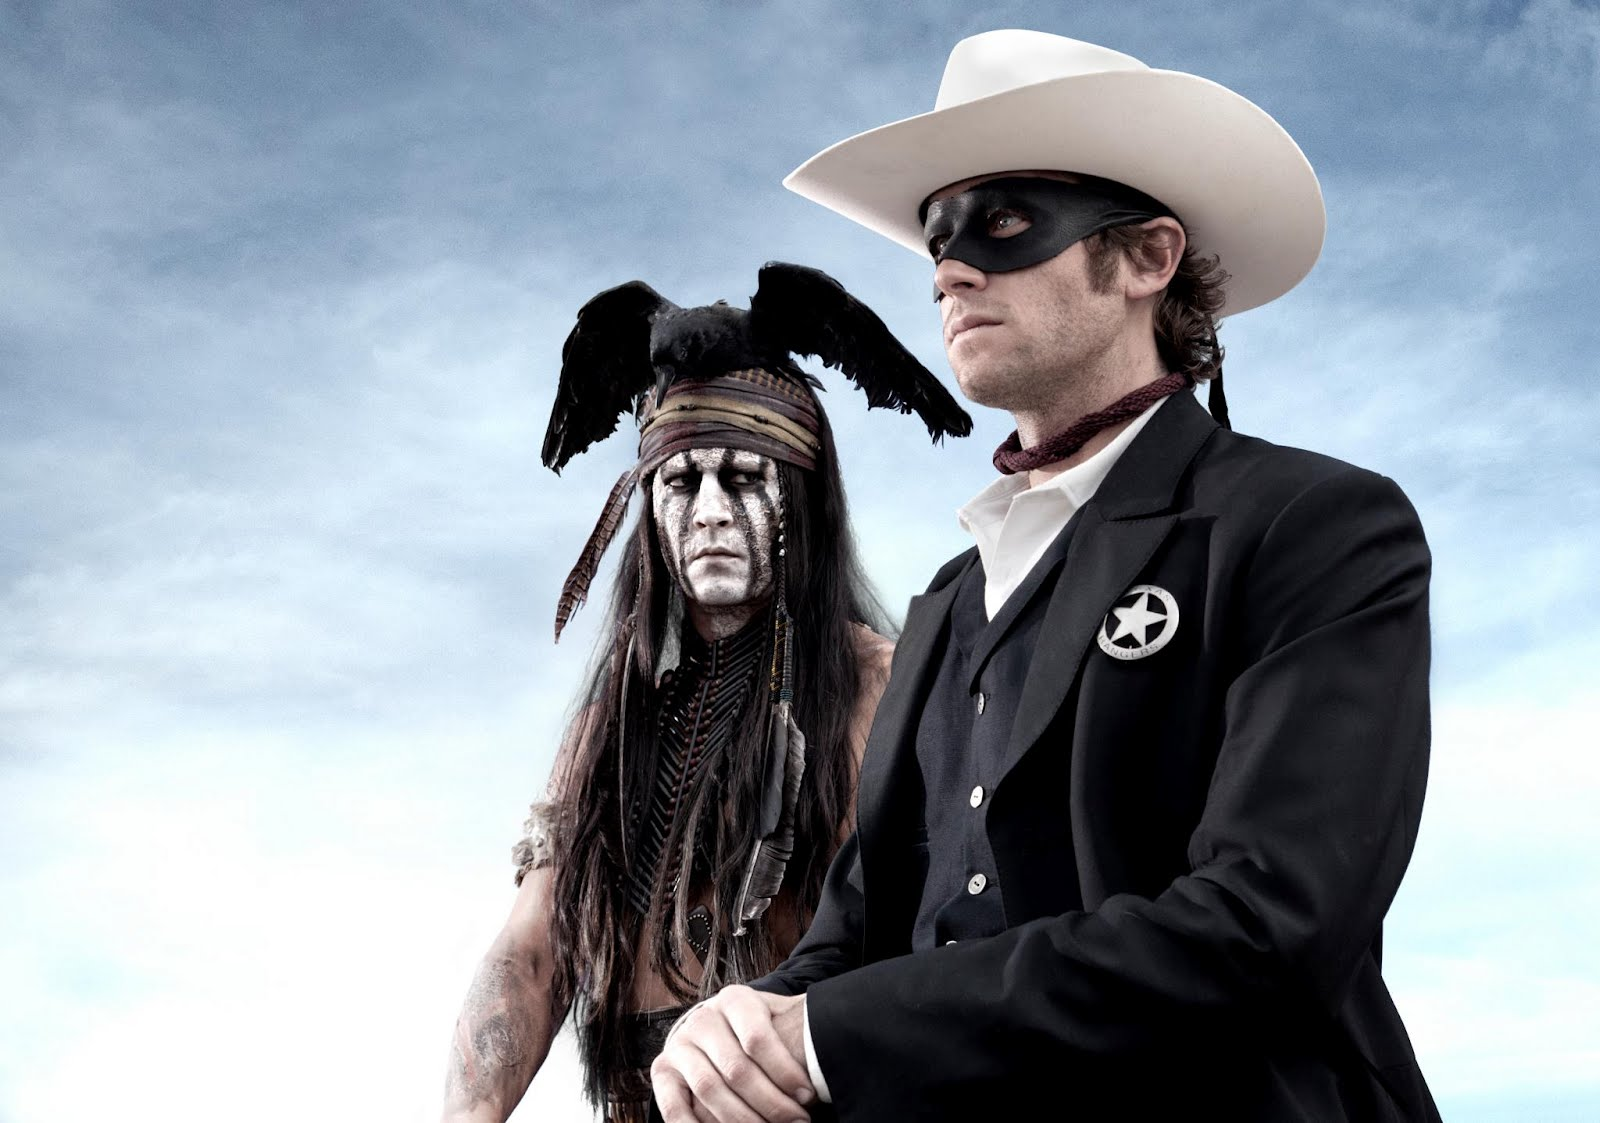 http://1.bp.blogspot.com/-sI0Ic5T89GI/T1tv_EgJLEI/AAAAAAAADAE/KHH2XdRZS-s/s1600/El-Llanero-Solitario-Disney-Imagen-Johnny-Depp-Toro-Armie-Hammer-The-Lone-Ranger.jpg